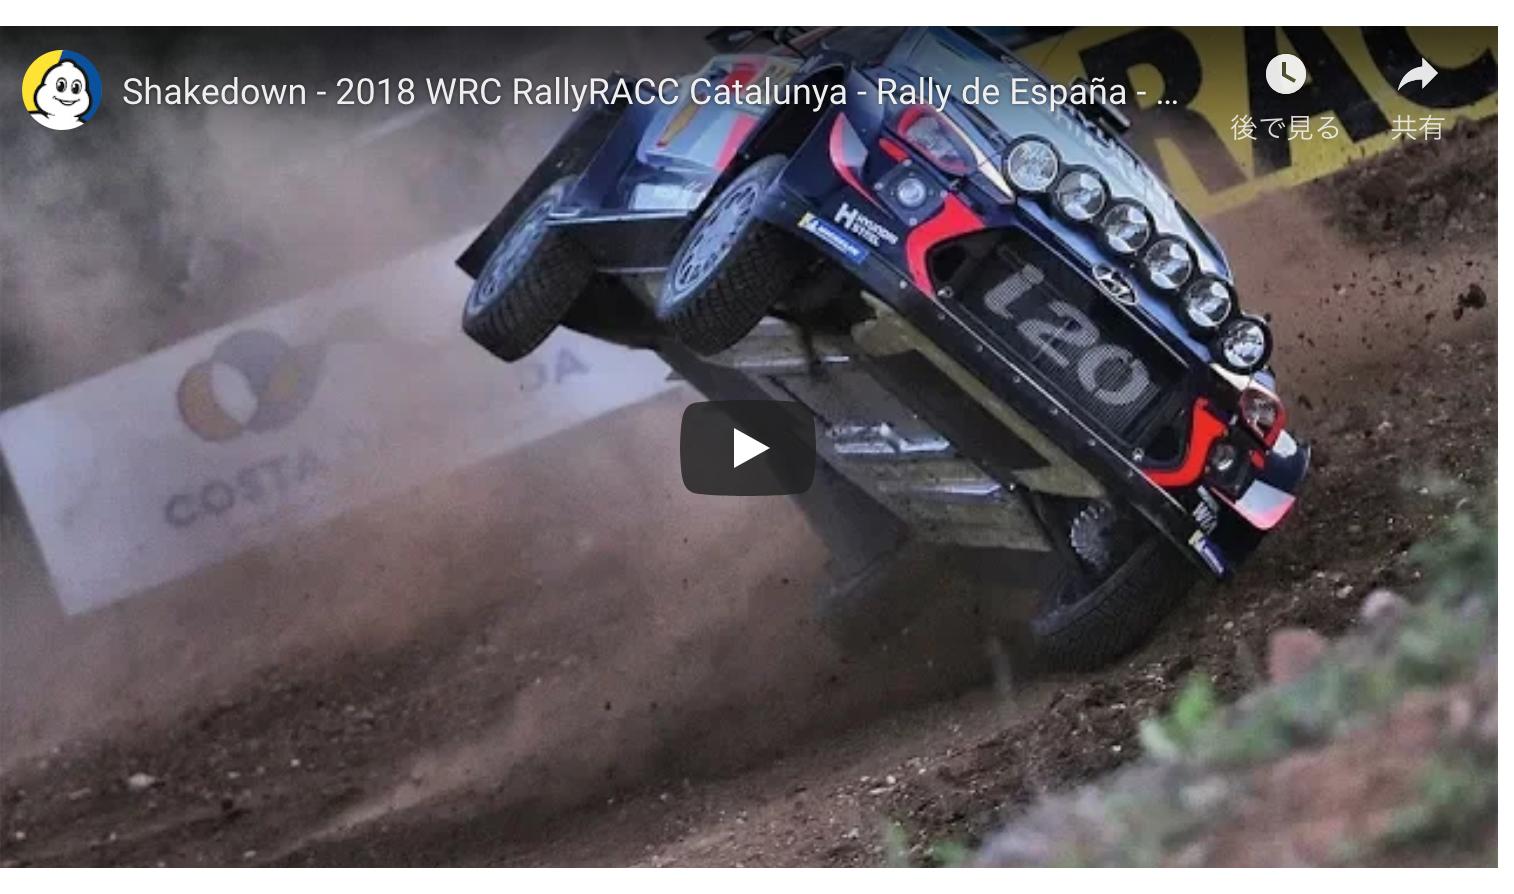 WRCラリースペイン速報。トップはオット・タナク。トヨタ勢頑張れ。残すはこのWRCスペインとWRCオーストラリア。ティエリー・ヌーベルかセバスチャン・オジエかオット・タナク大逆転でドライバーズチャンピオンになるか?楽しみ〜。